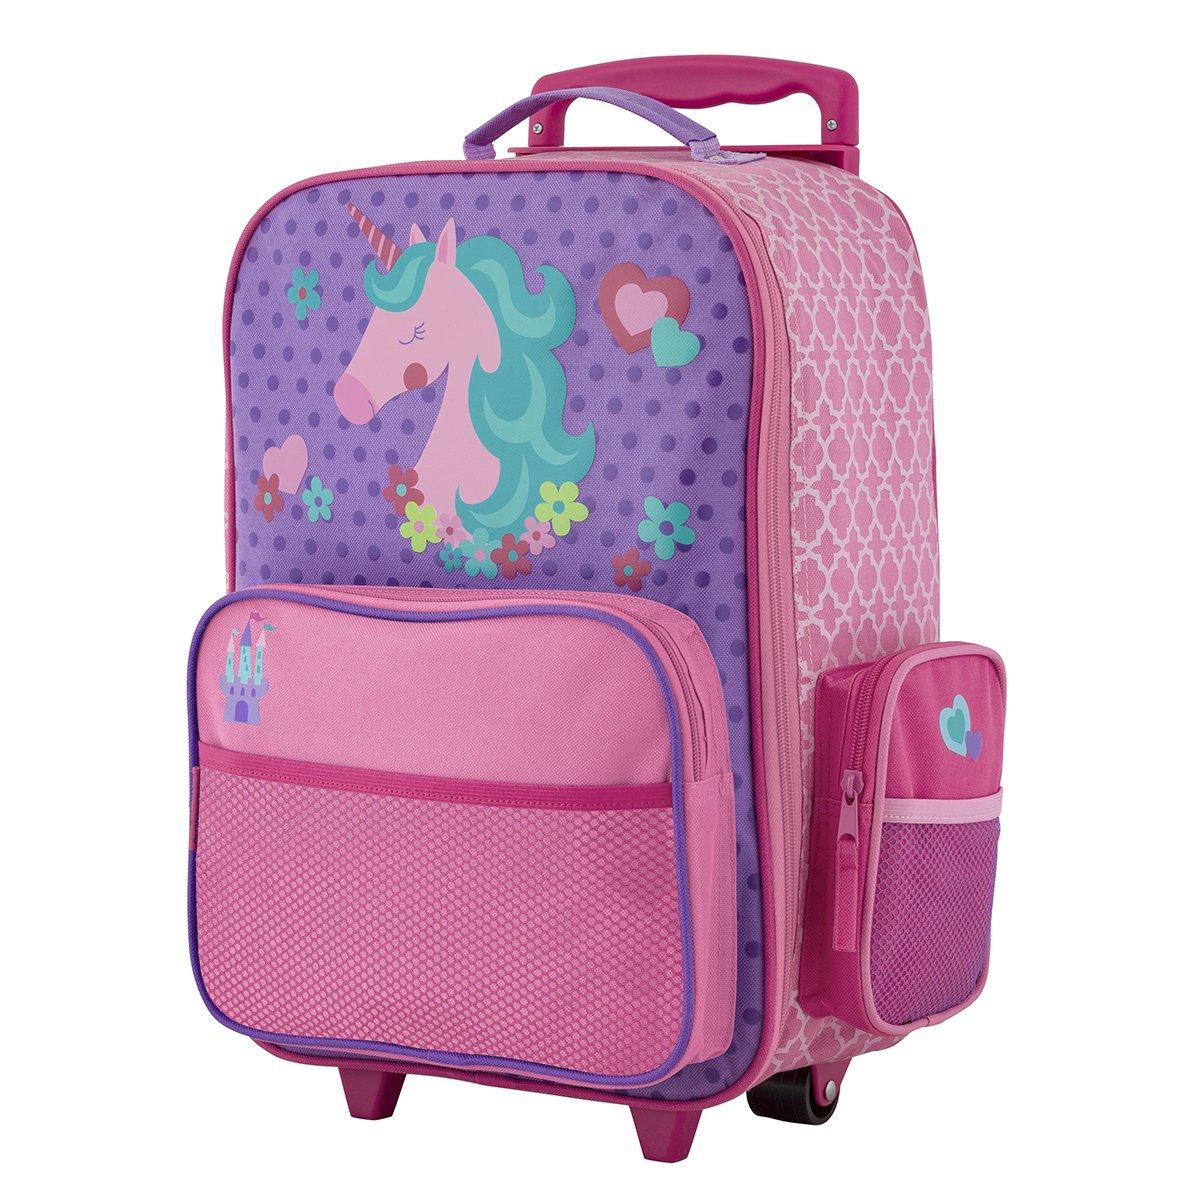 Stephen Joseph Classic Rolling Luggage, Unicorn